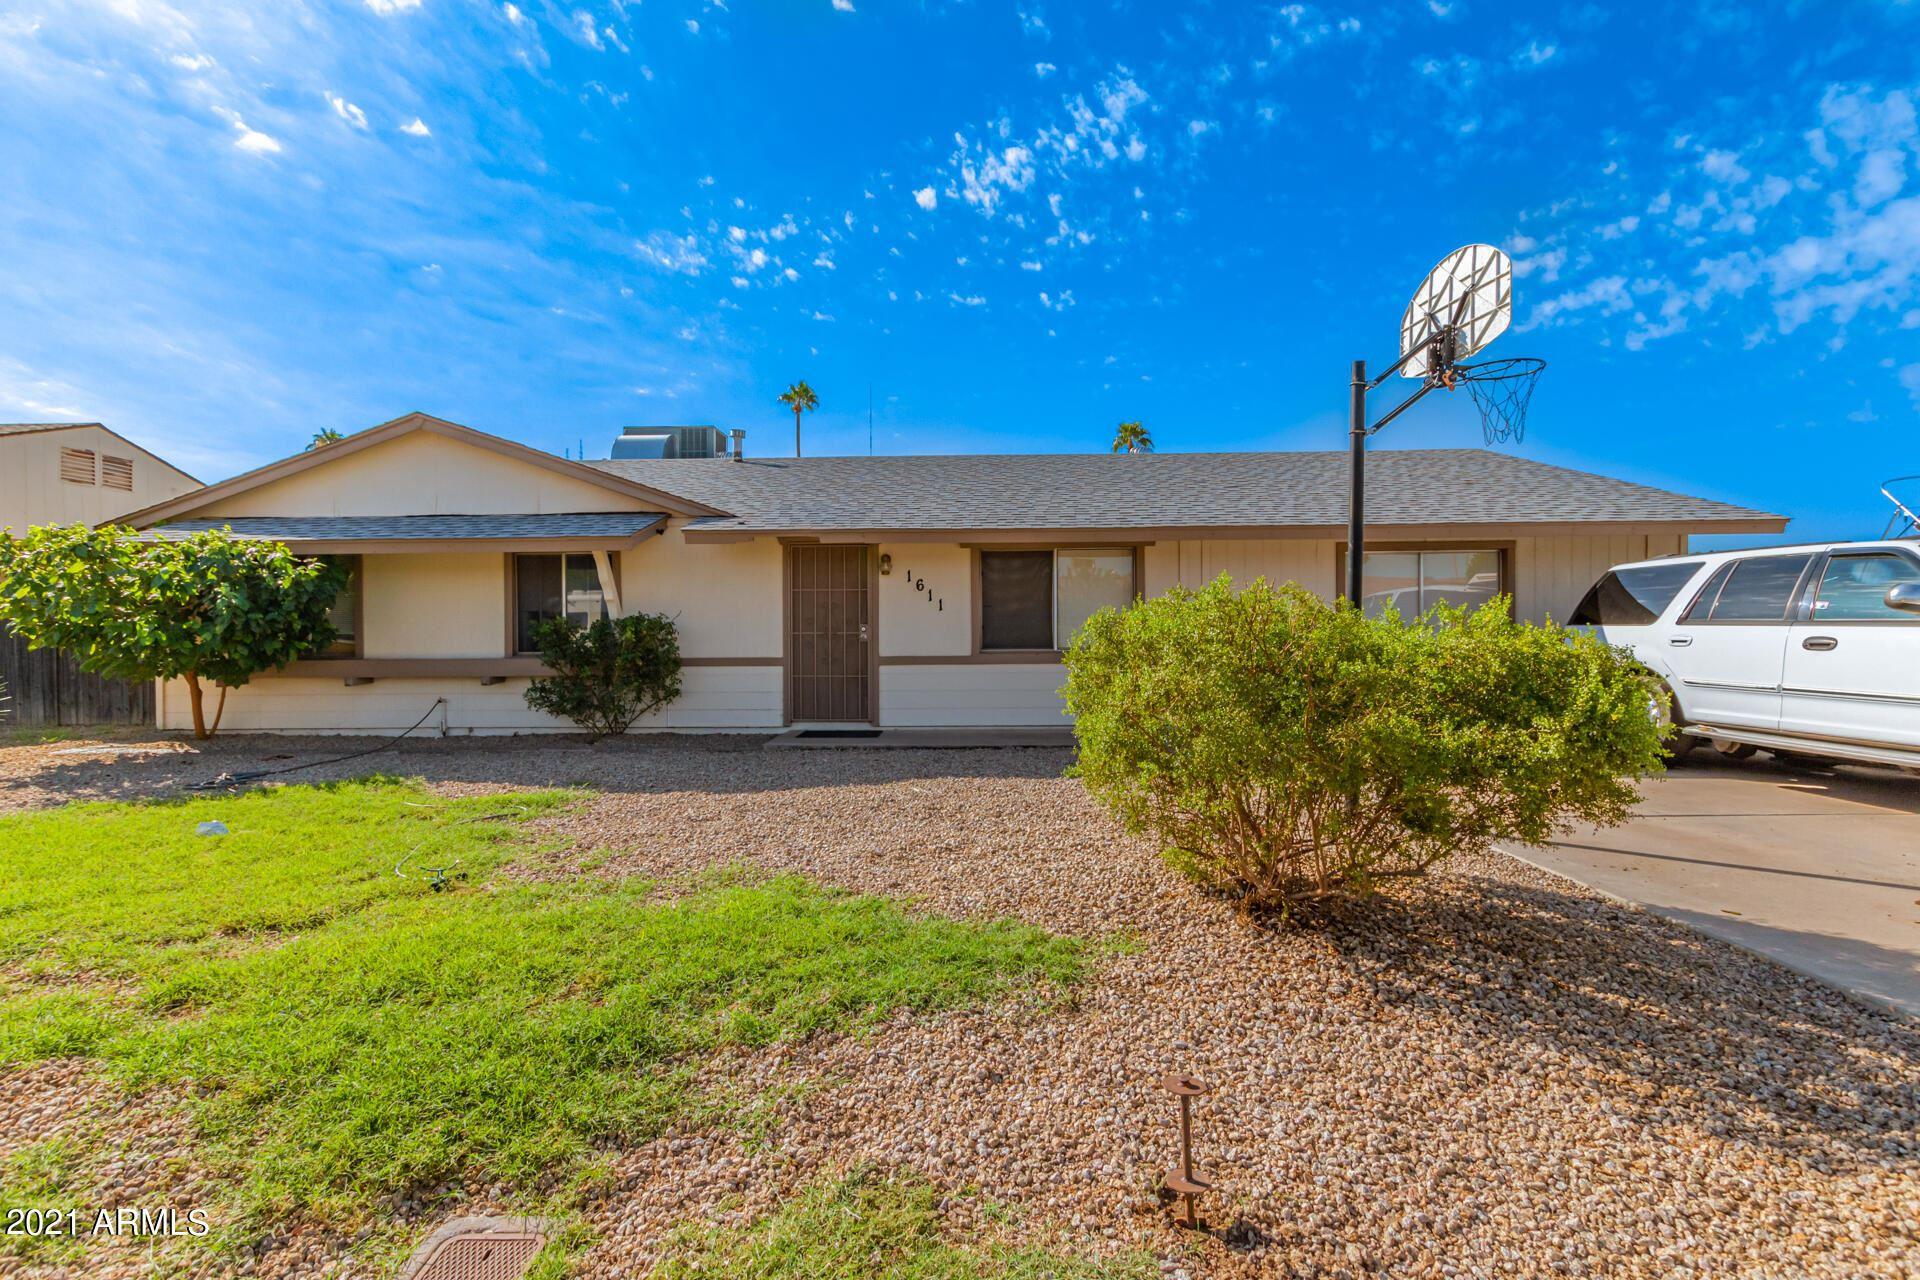 Photo of 1611 W ANDORRA Drive, Phoenix, AZ 85029 (MLS # 6298735)